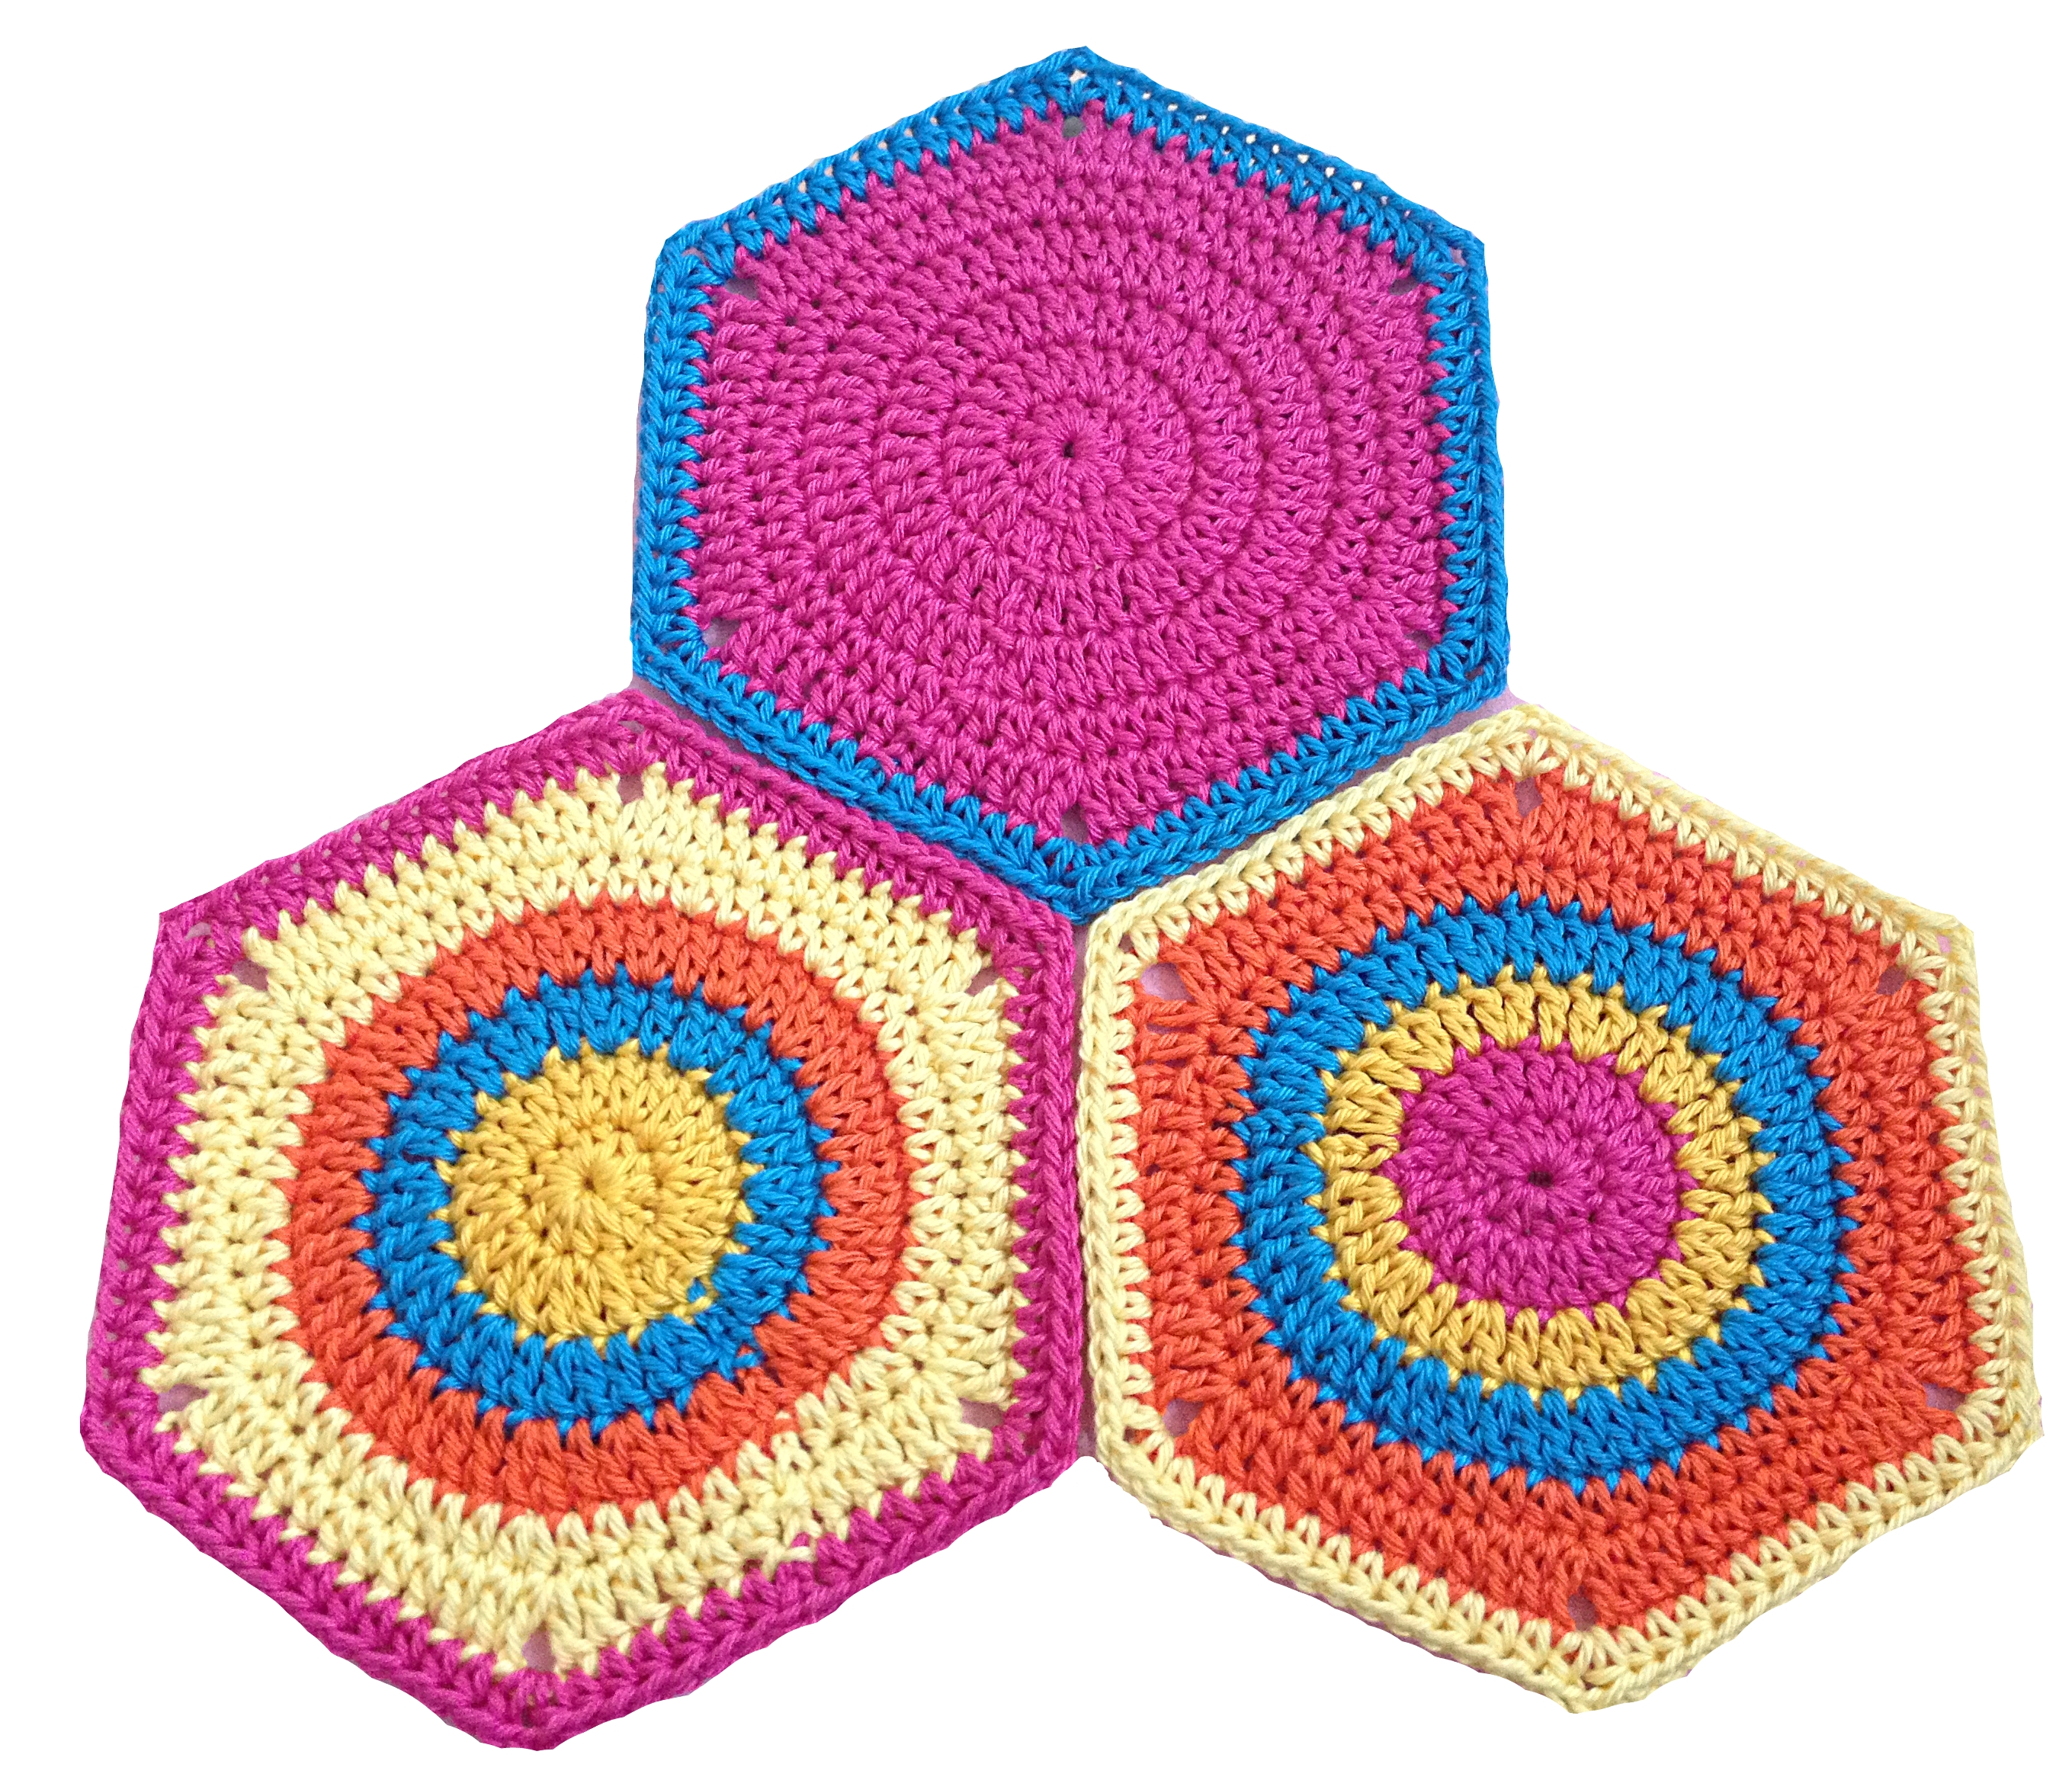 Granny Square Hexagon TwistySix - Häkelanleitung PDF